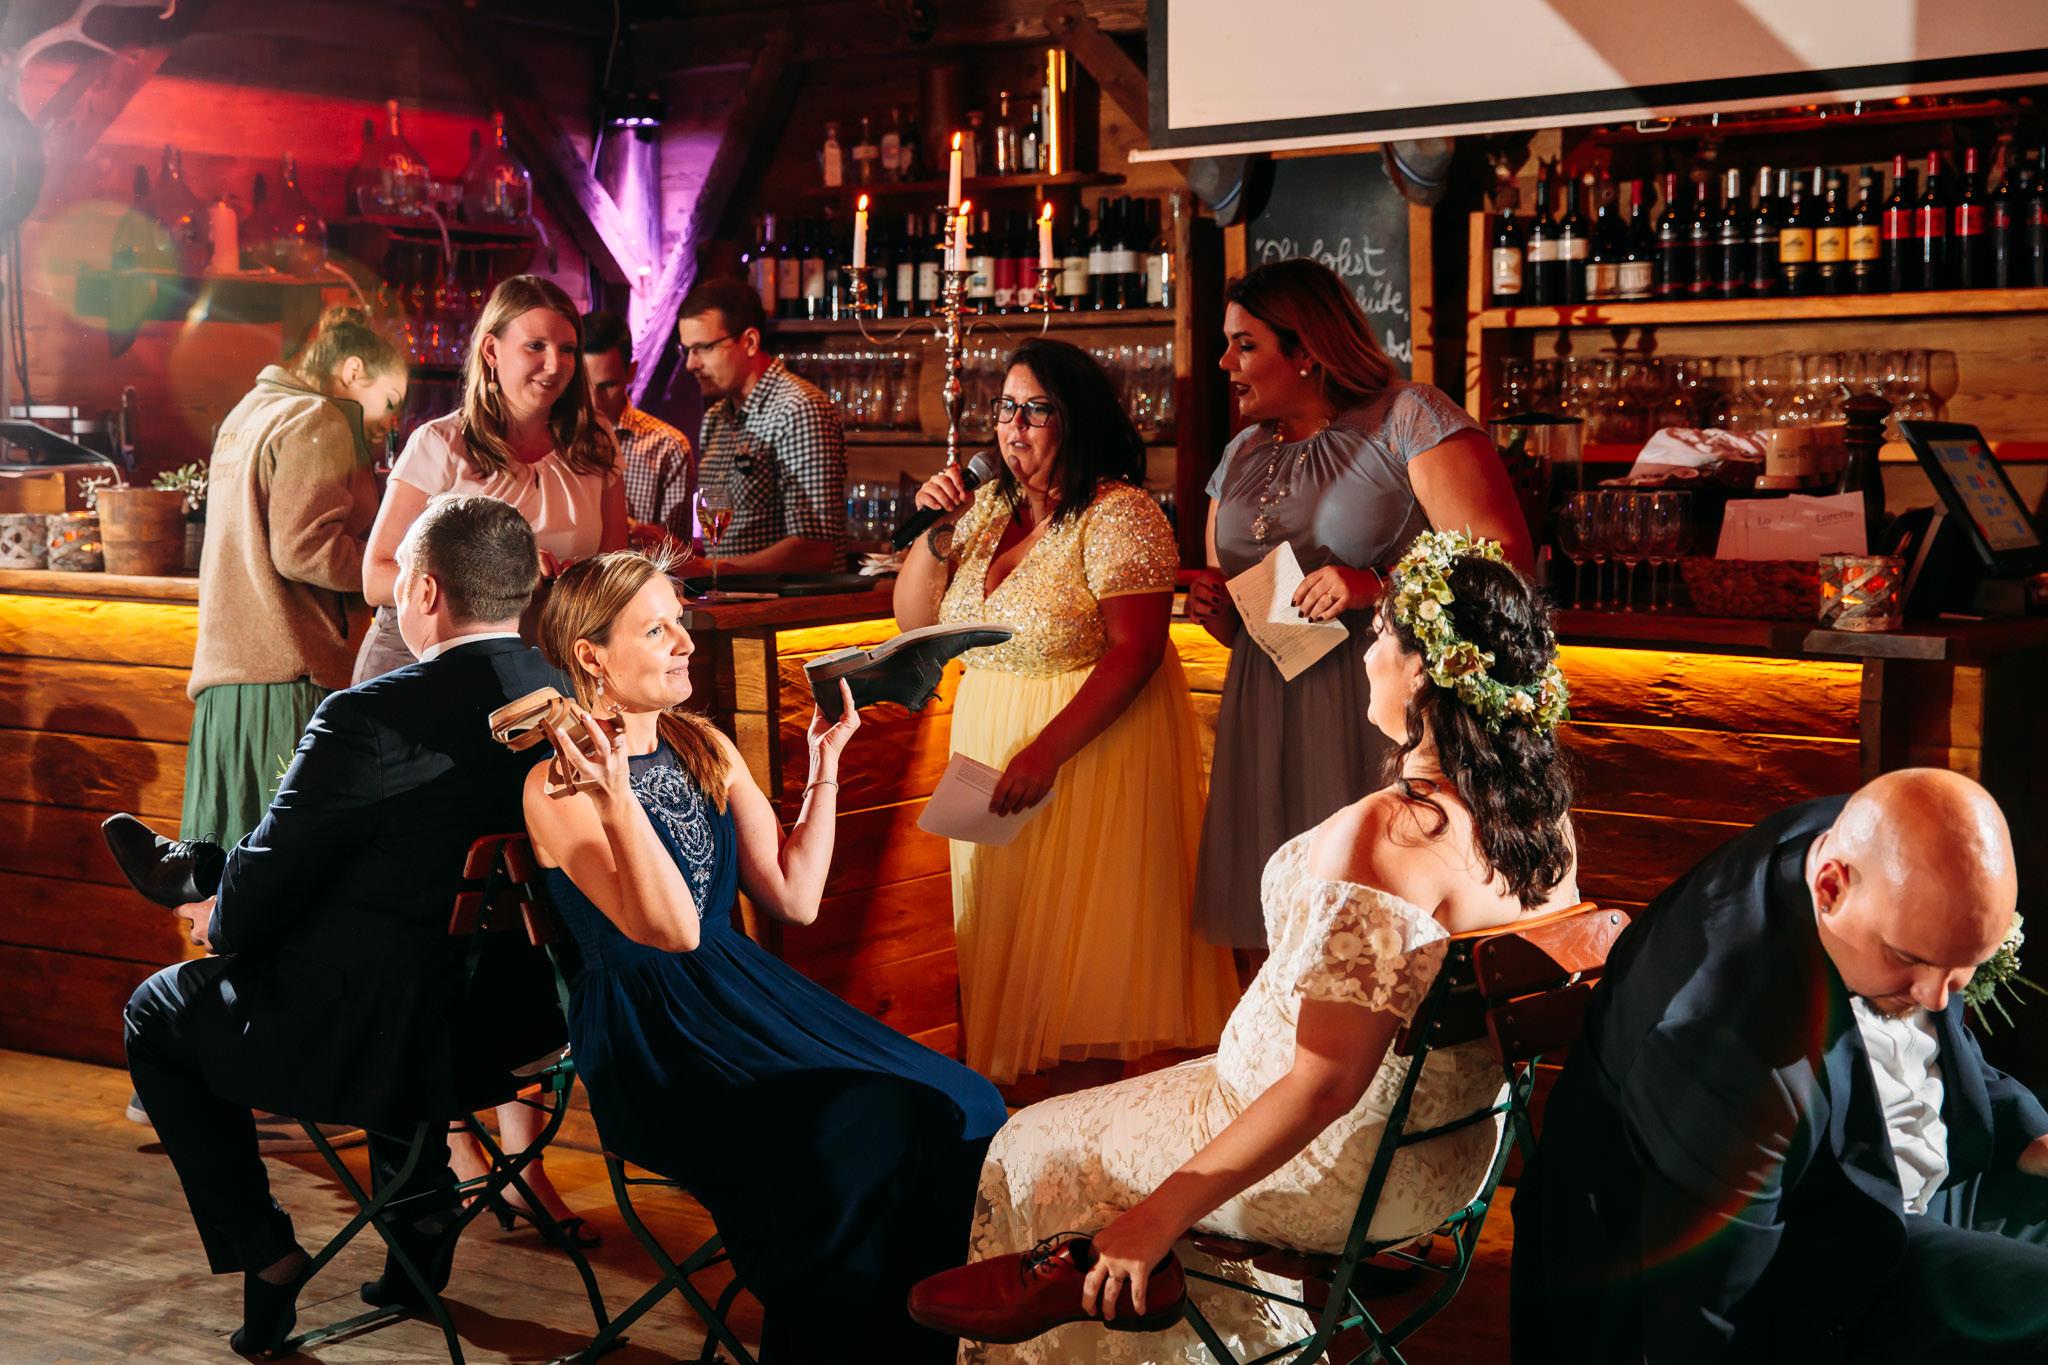 180825_Hochzeit_Berlin_Wannsee_Almhuette_Loretta_web_0017.jpg